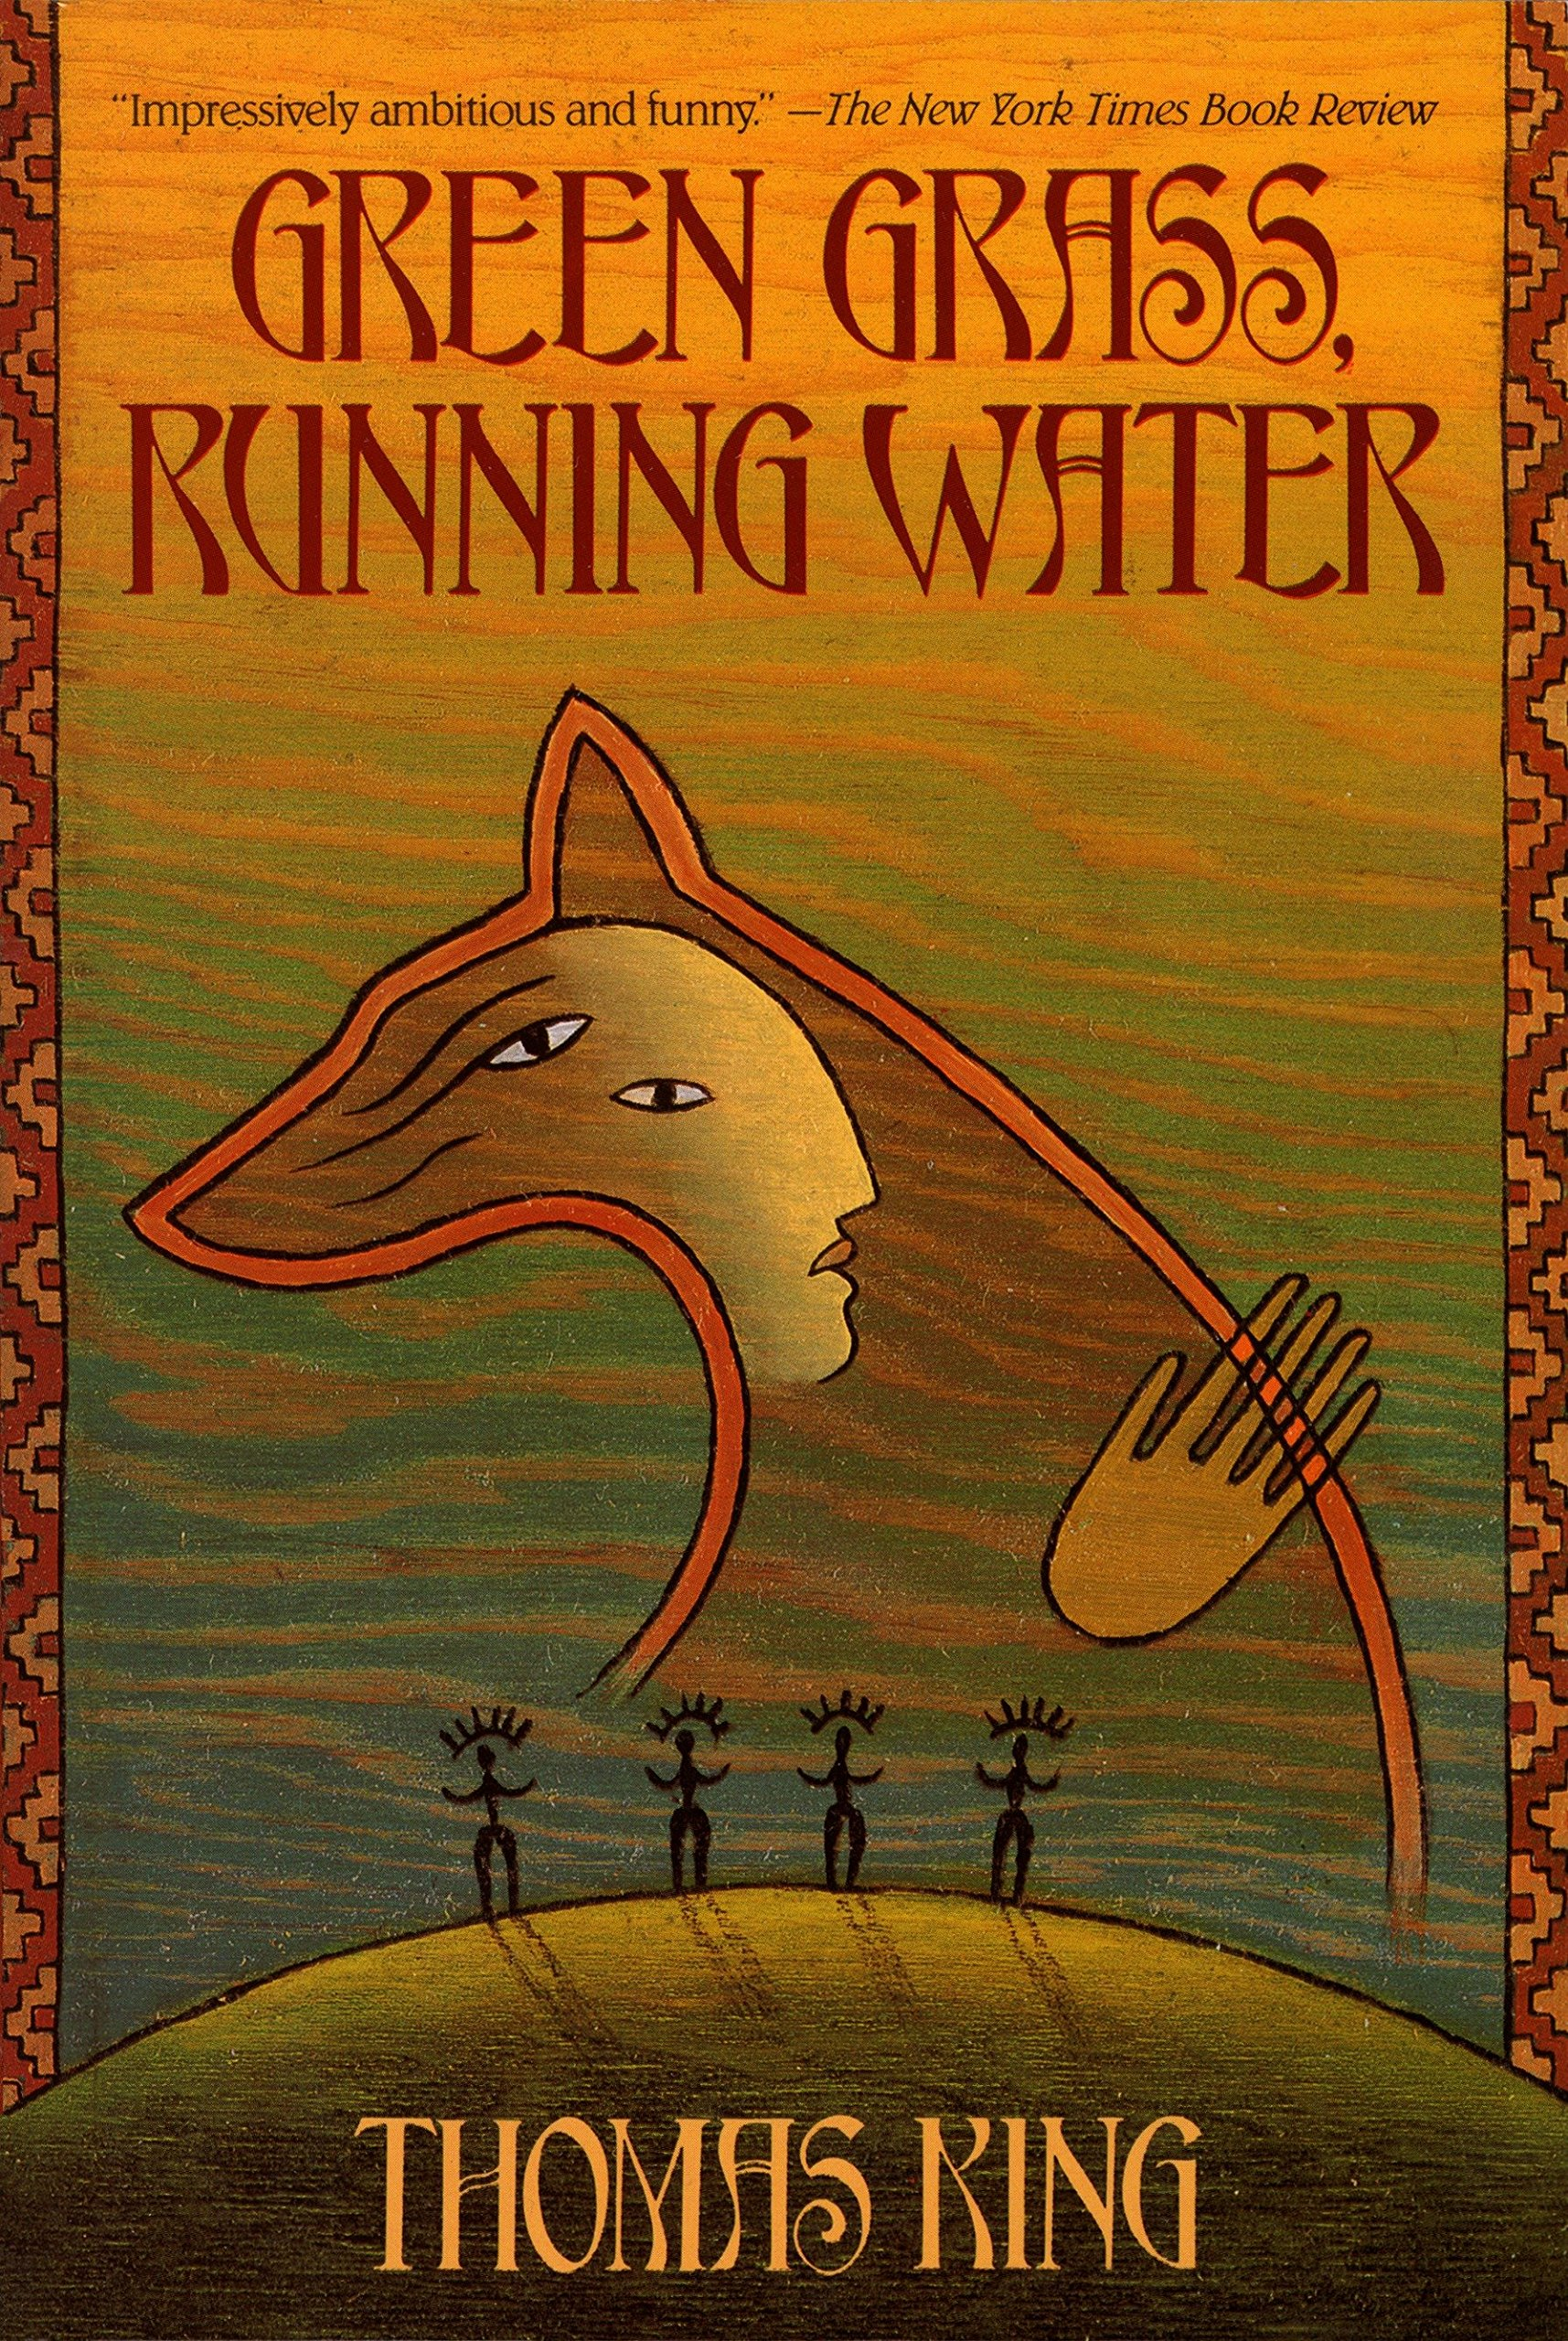 Green Grass, Running Water: A Novel: King, Thomas: 9780553373684:  Amazon.com: Books